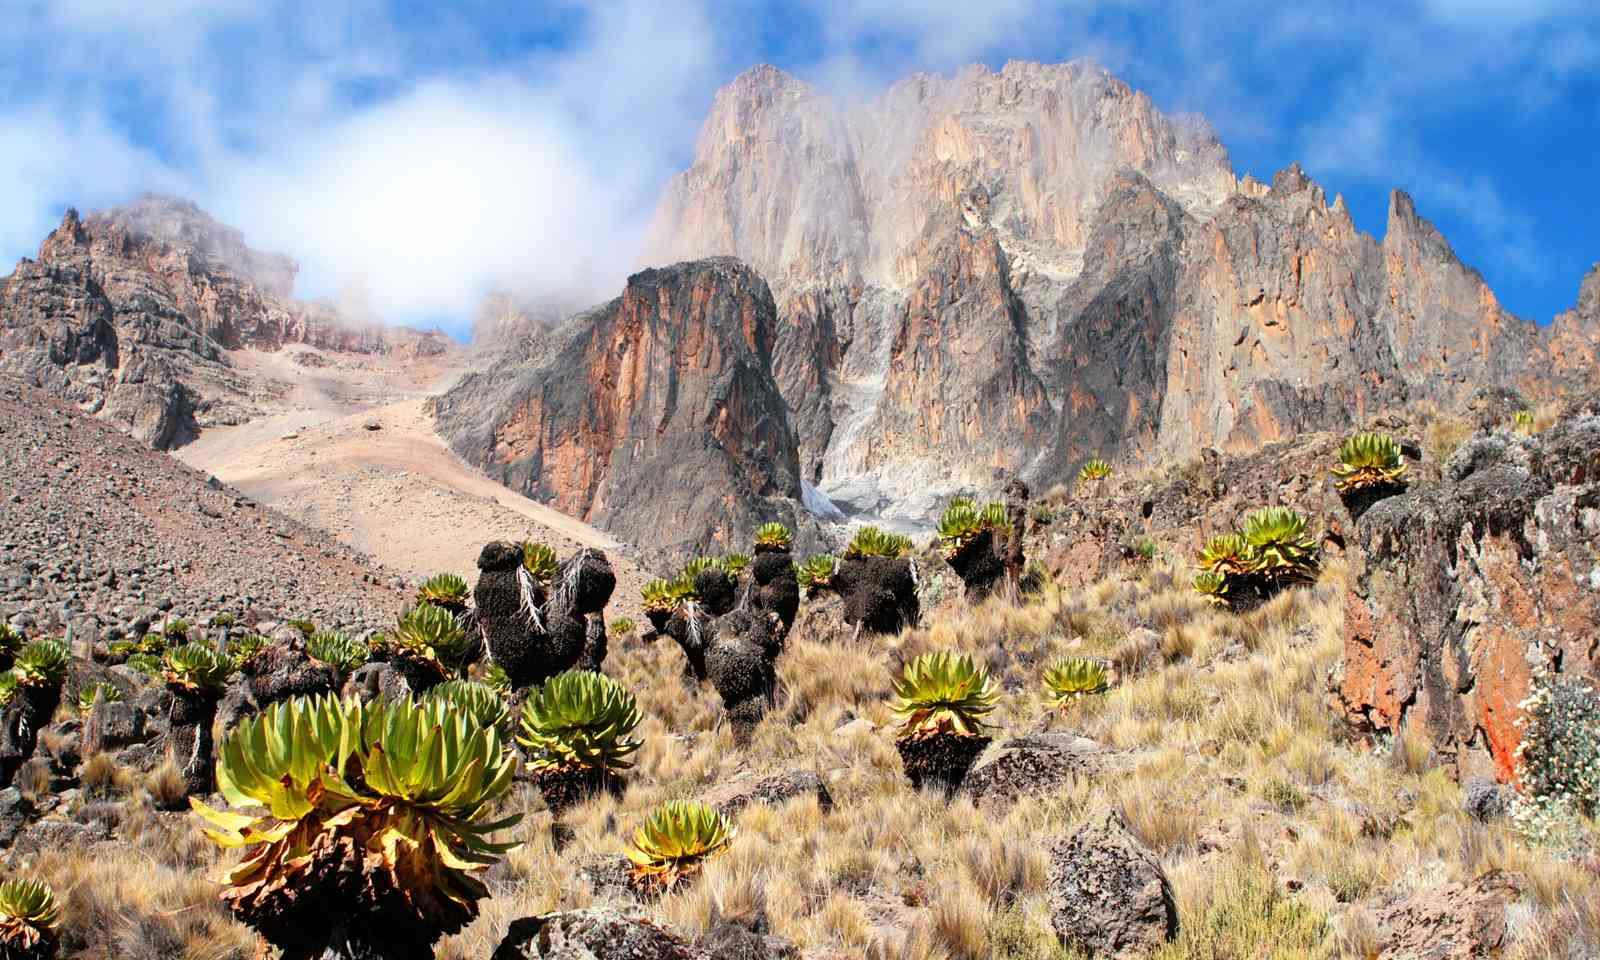 Mount Kenya. Via ferrata not shown. (Dreamstime)